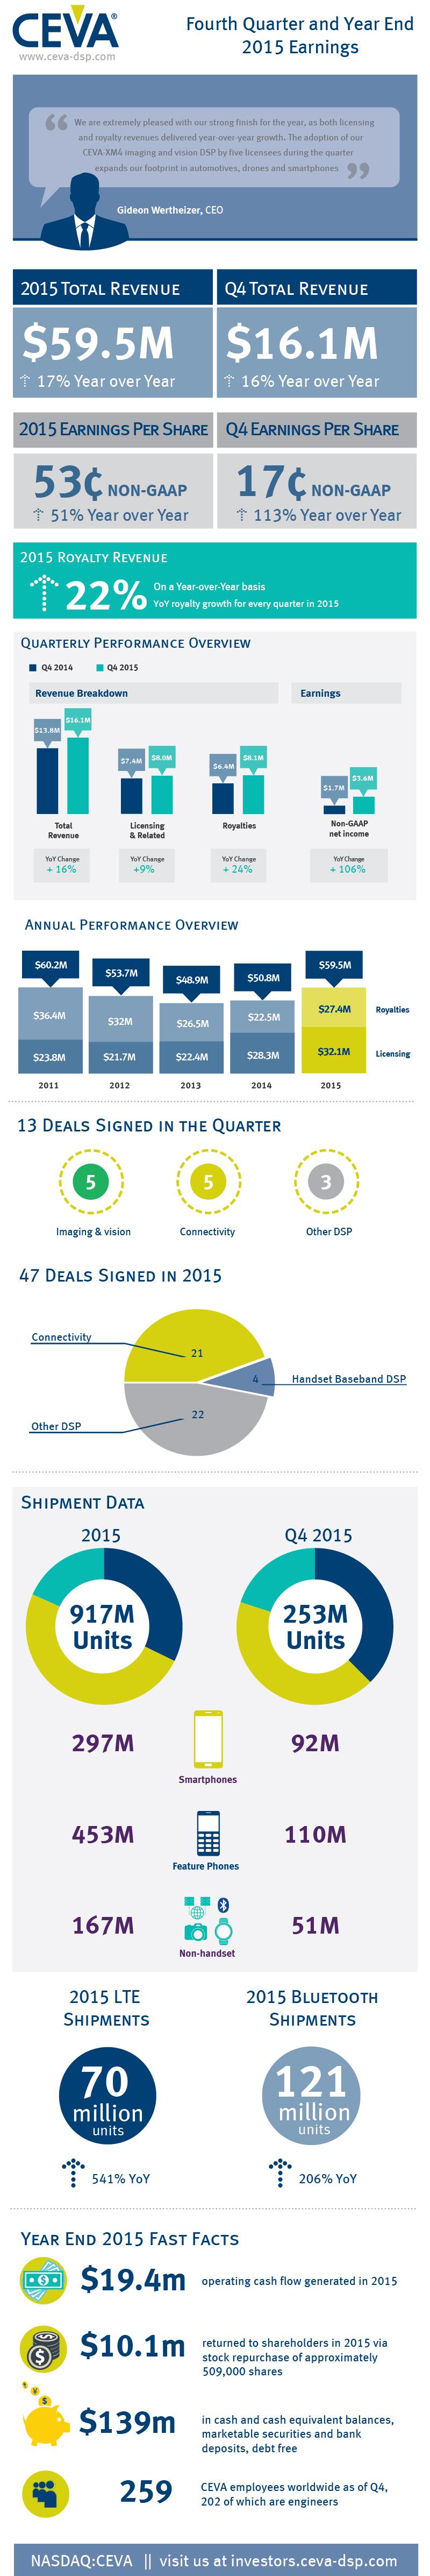 CEVA_Q4_2015_infographic_blog